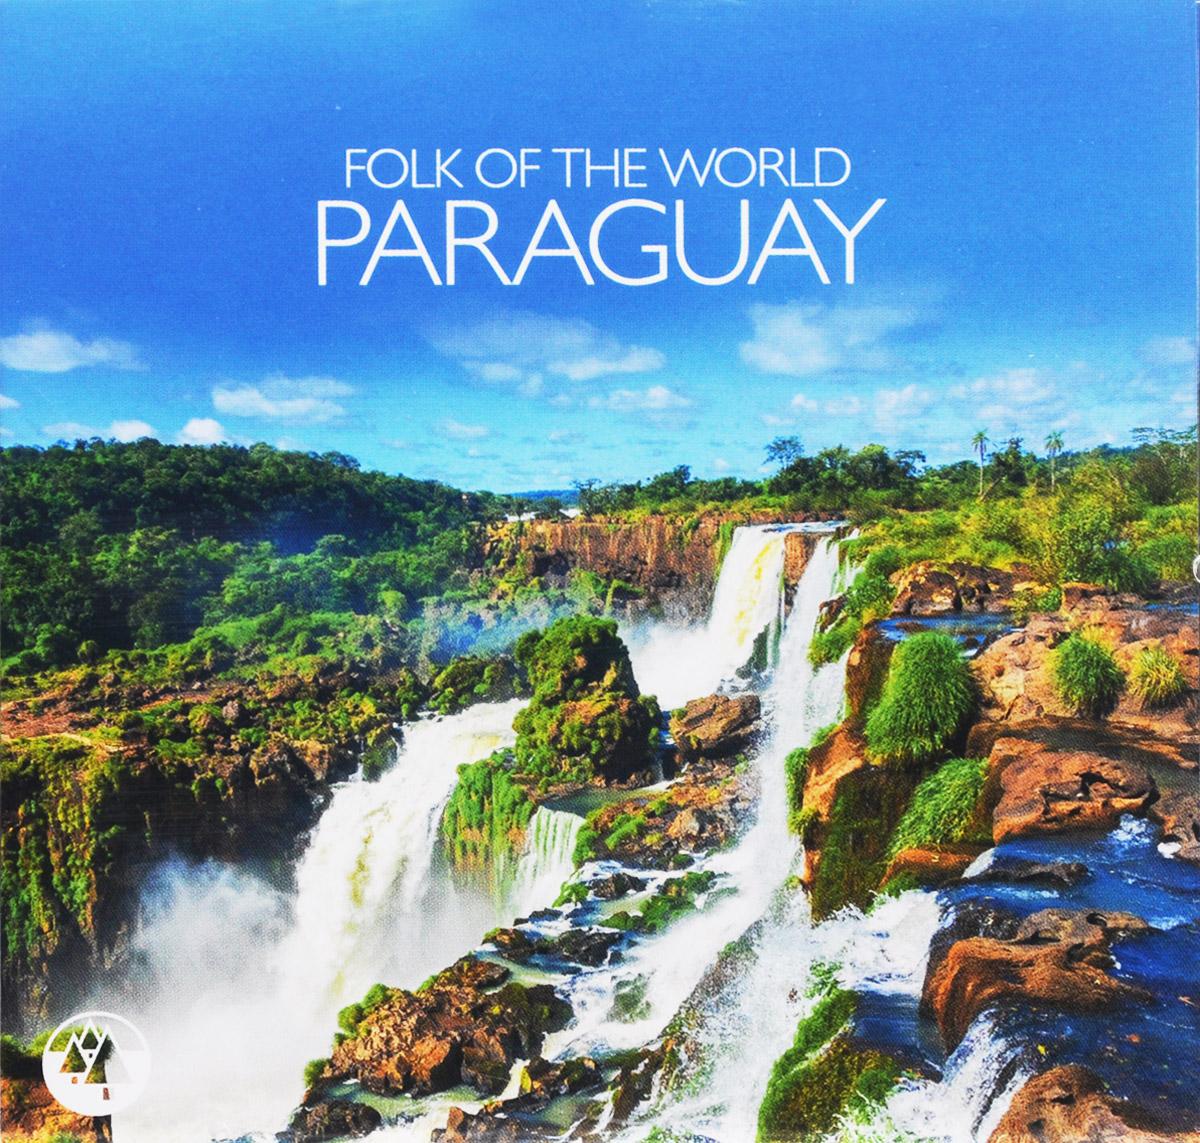 Folk Of The World. Paraguay folk of the world brazil